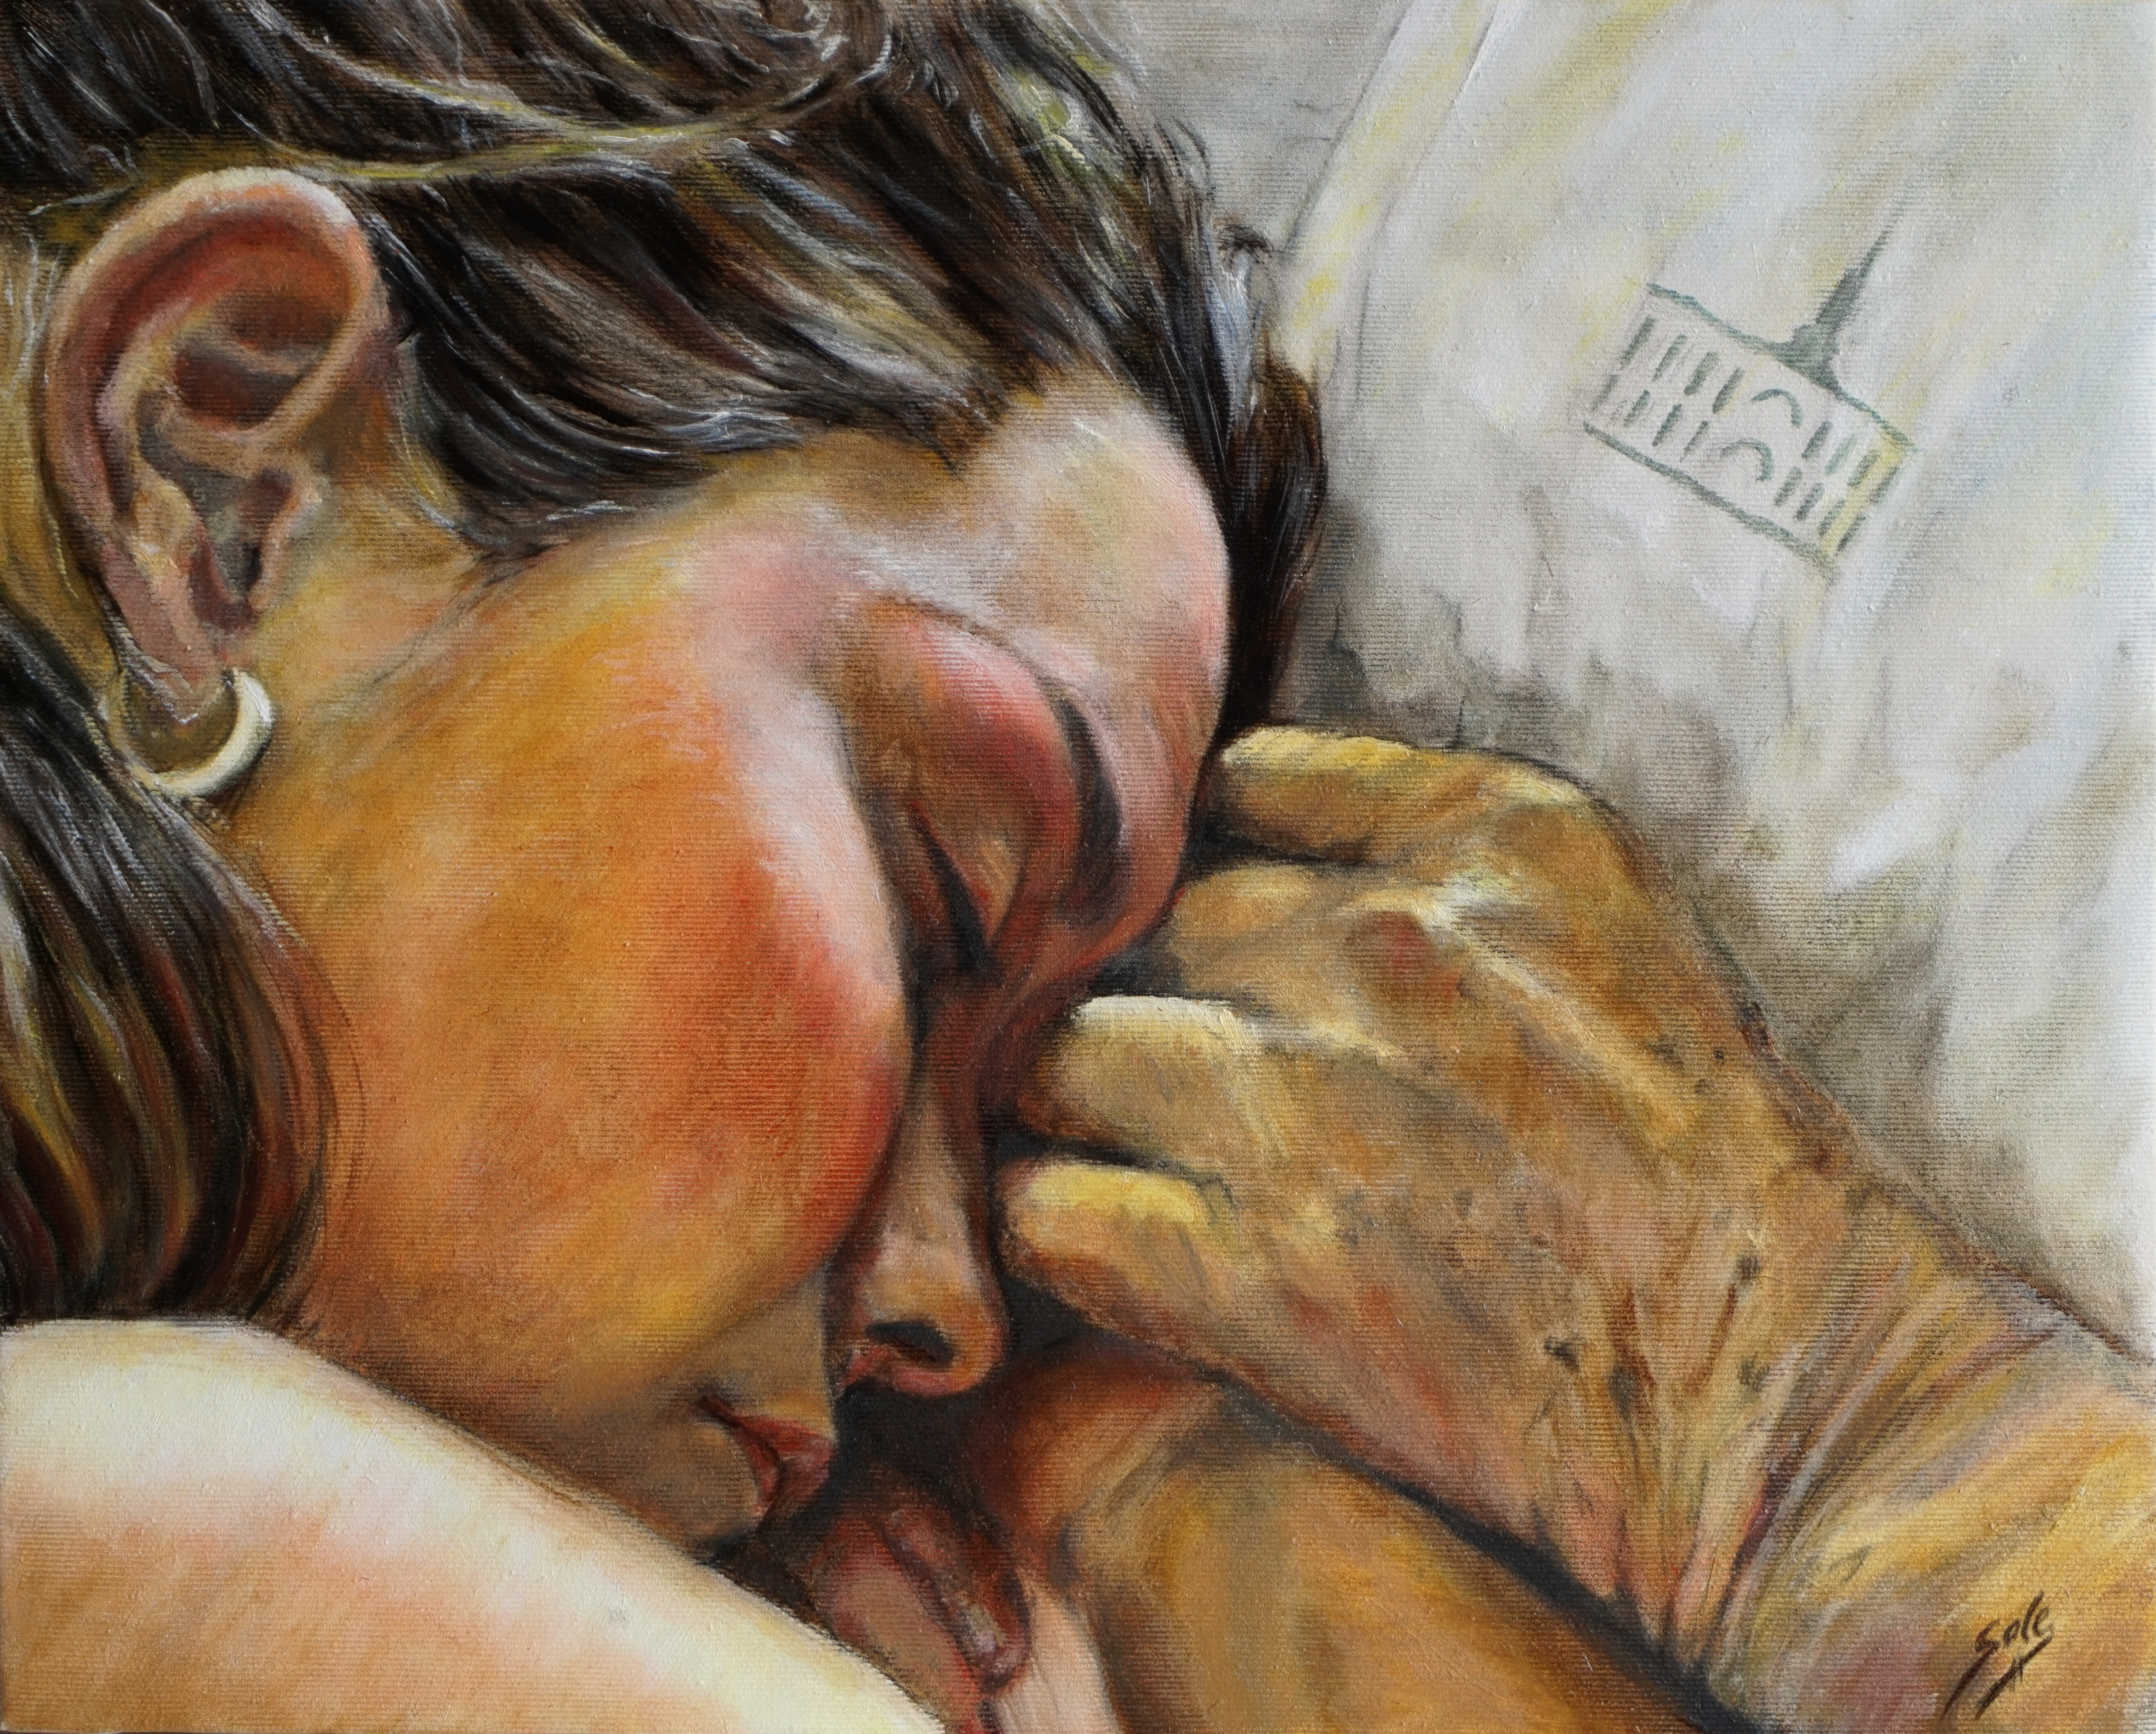 Abrazando tu último suspiro